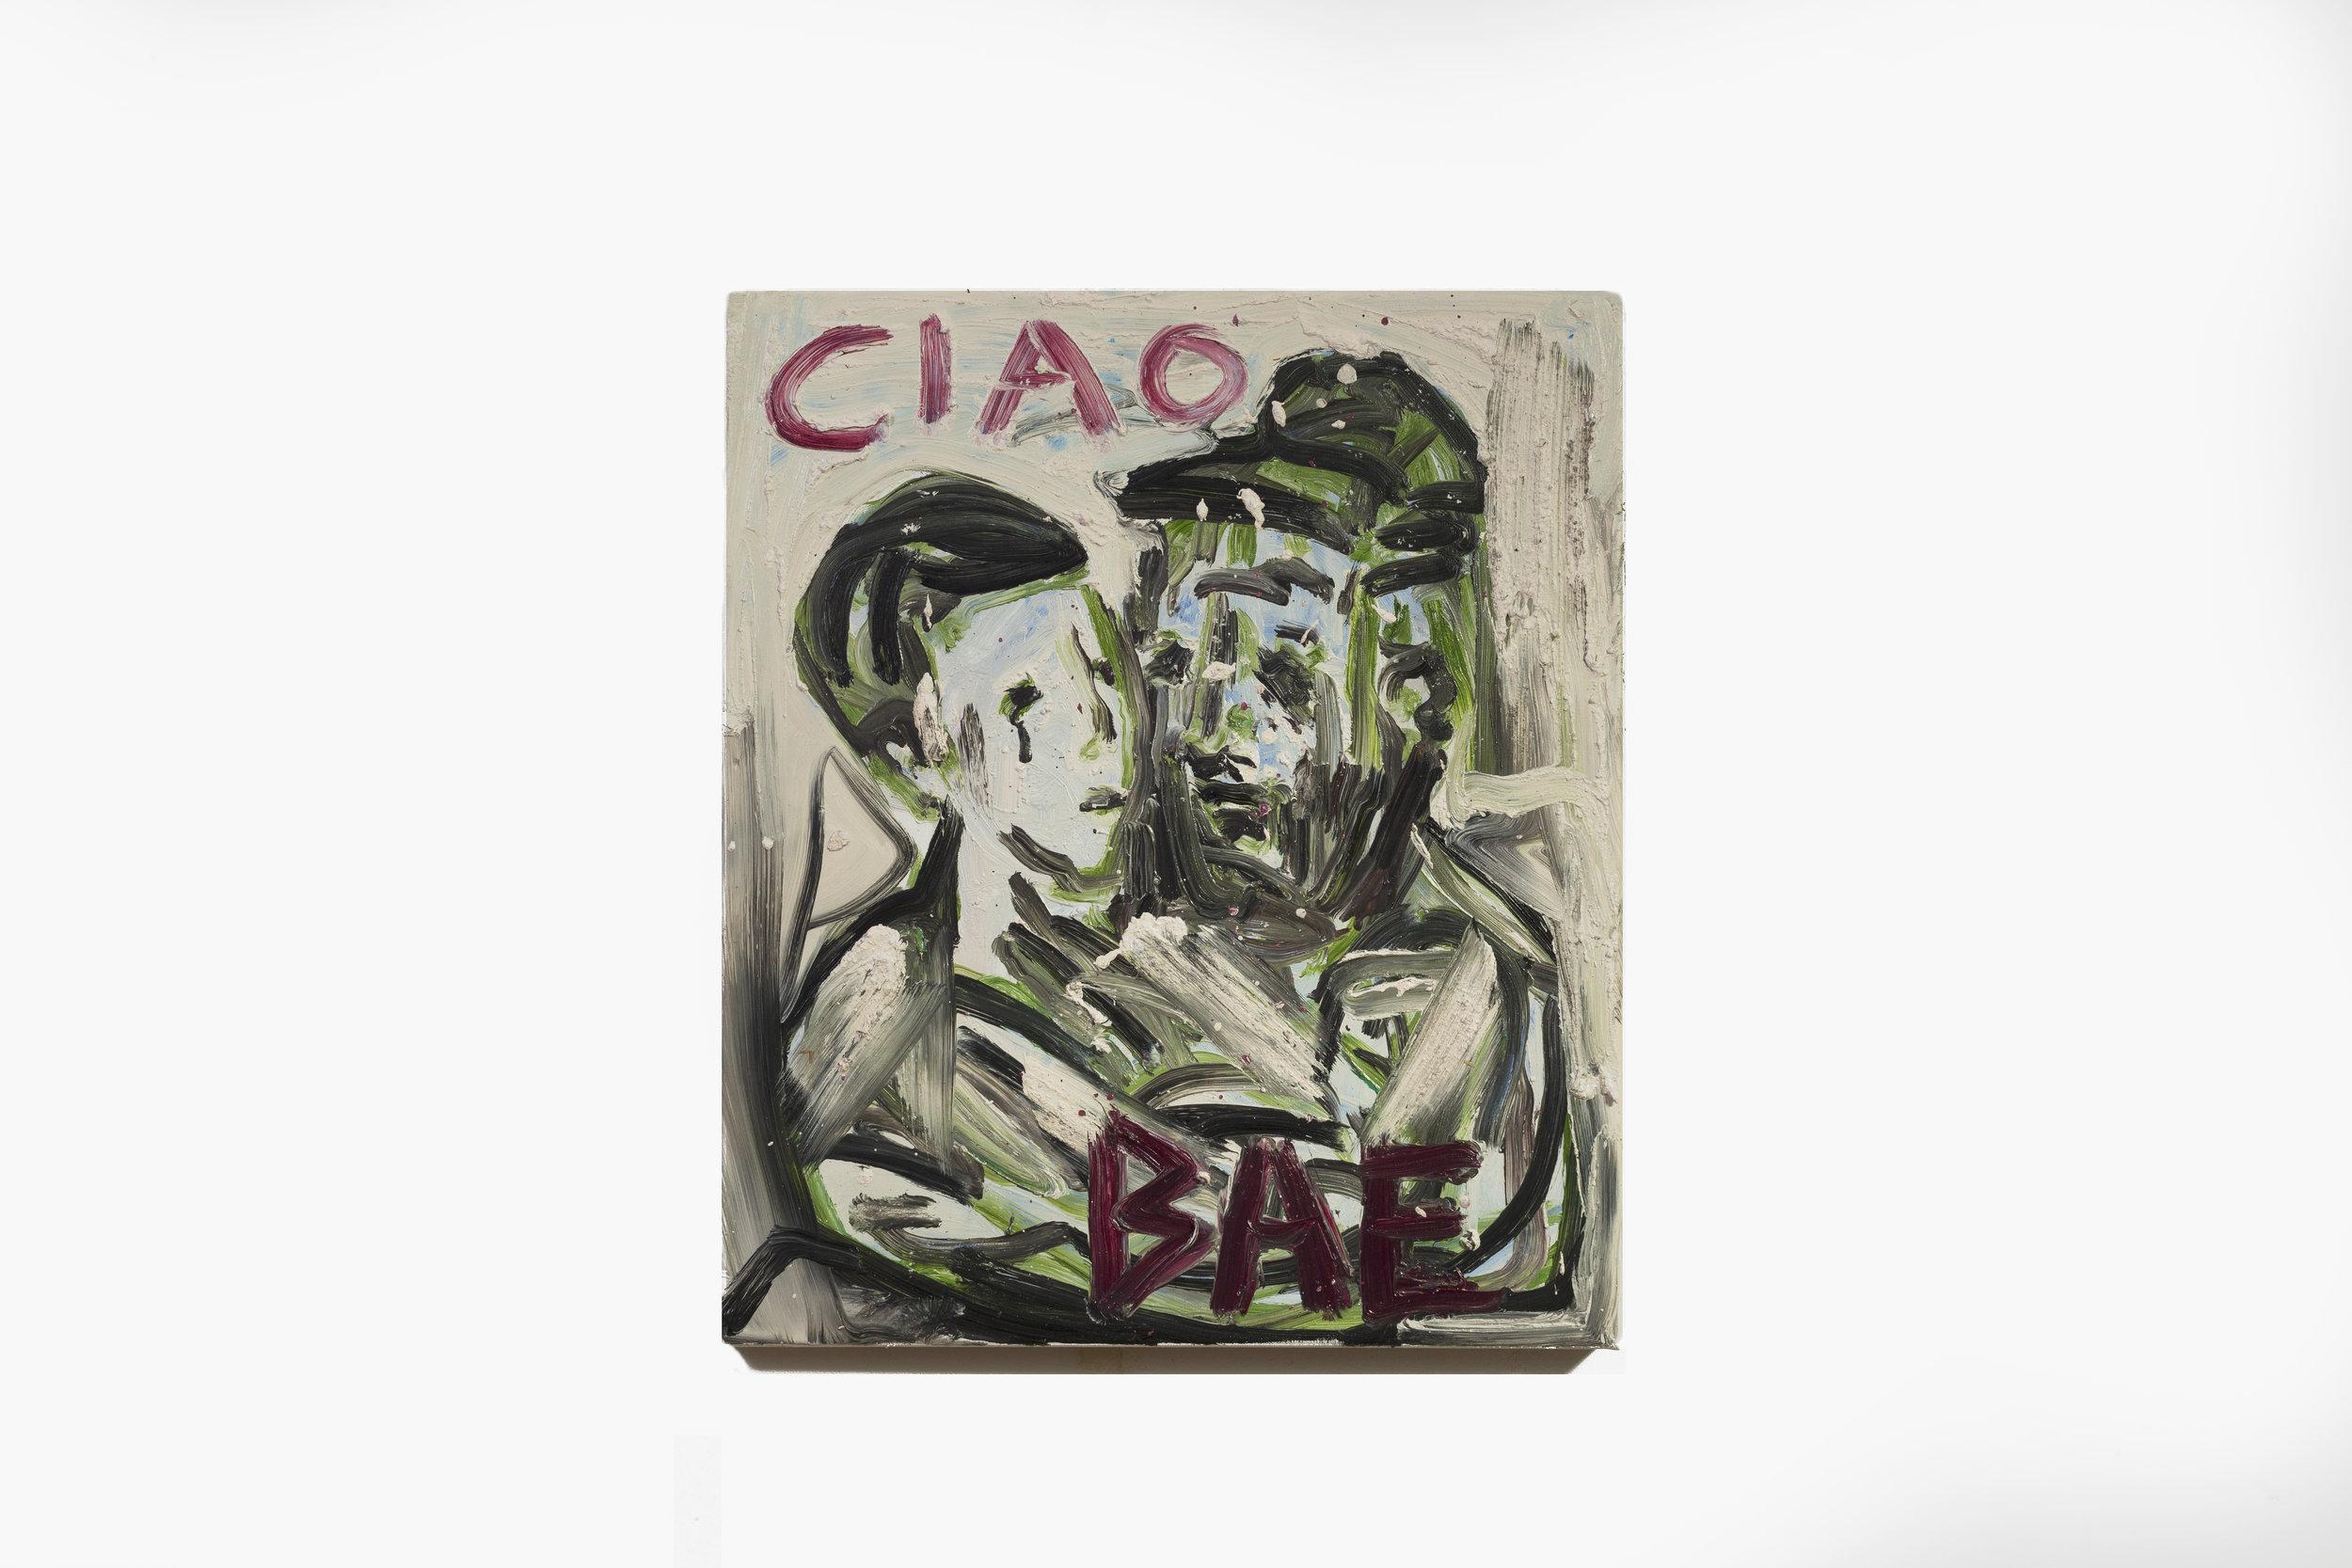 CIAO BAE, 2019